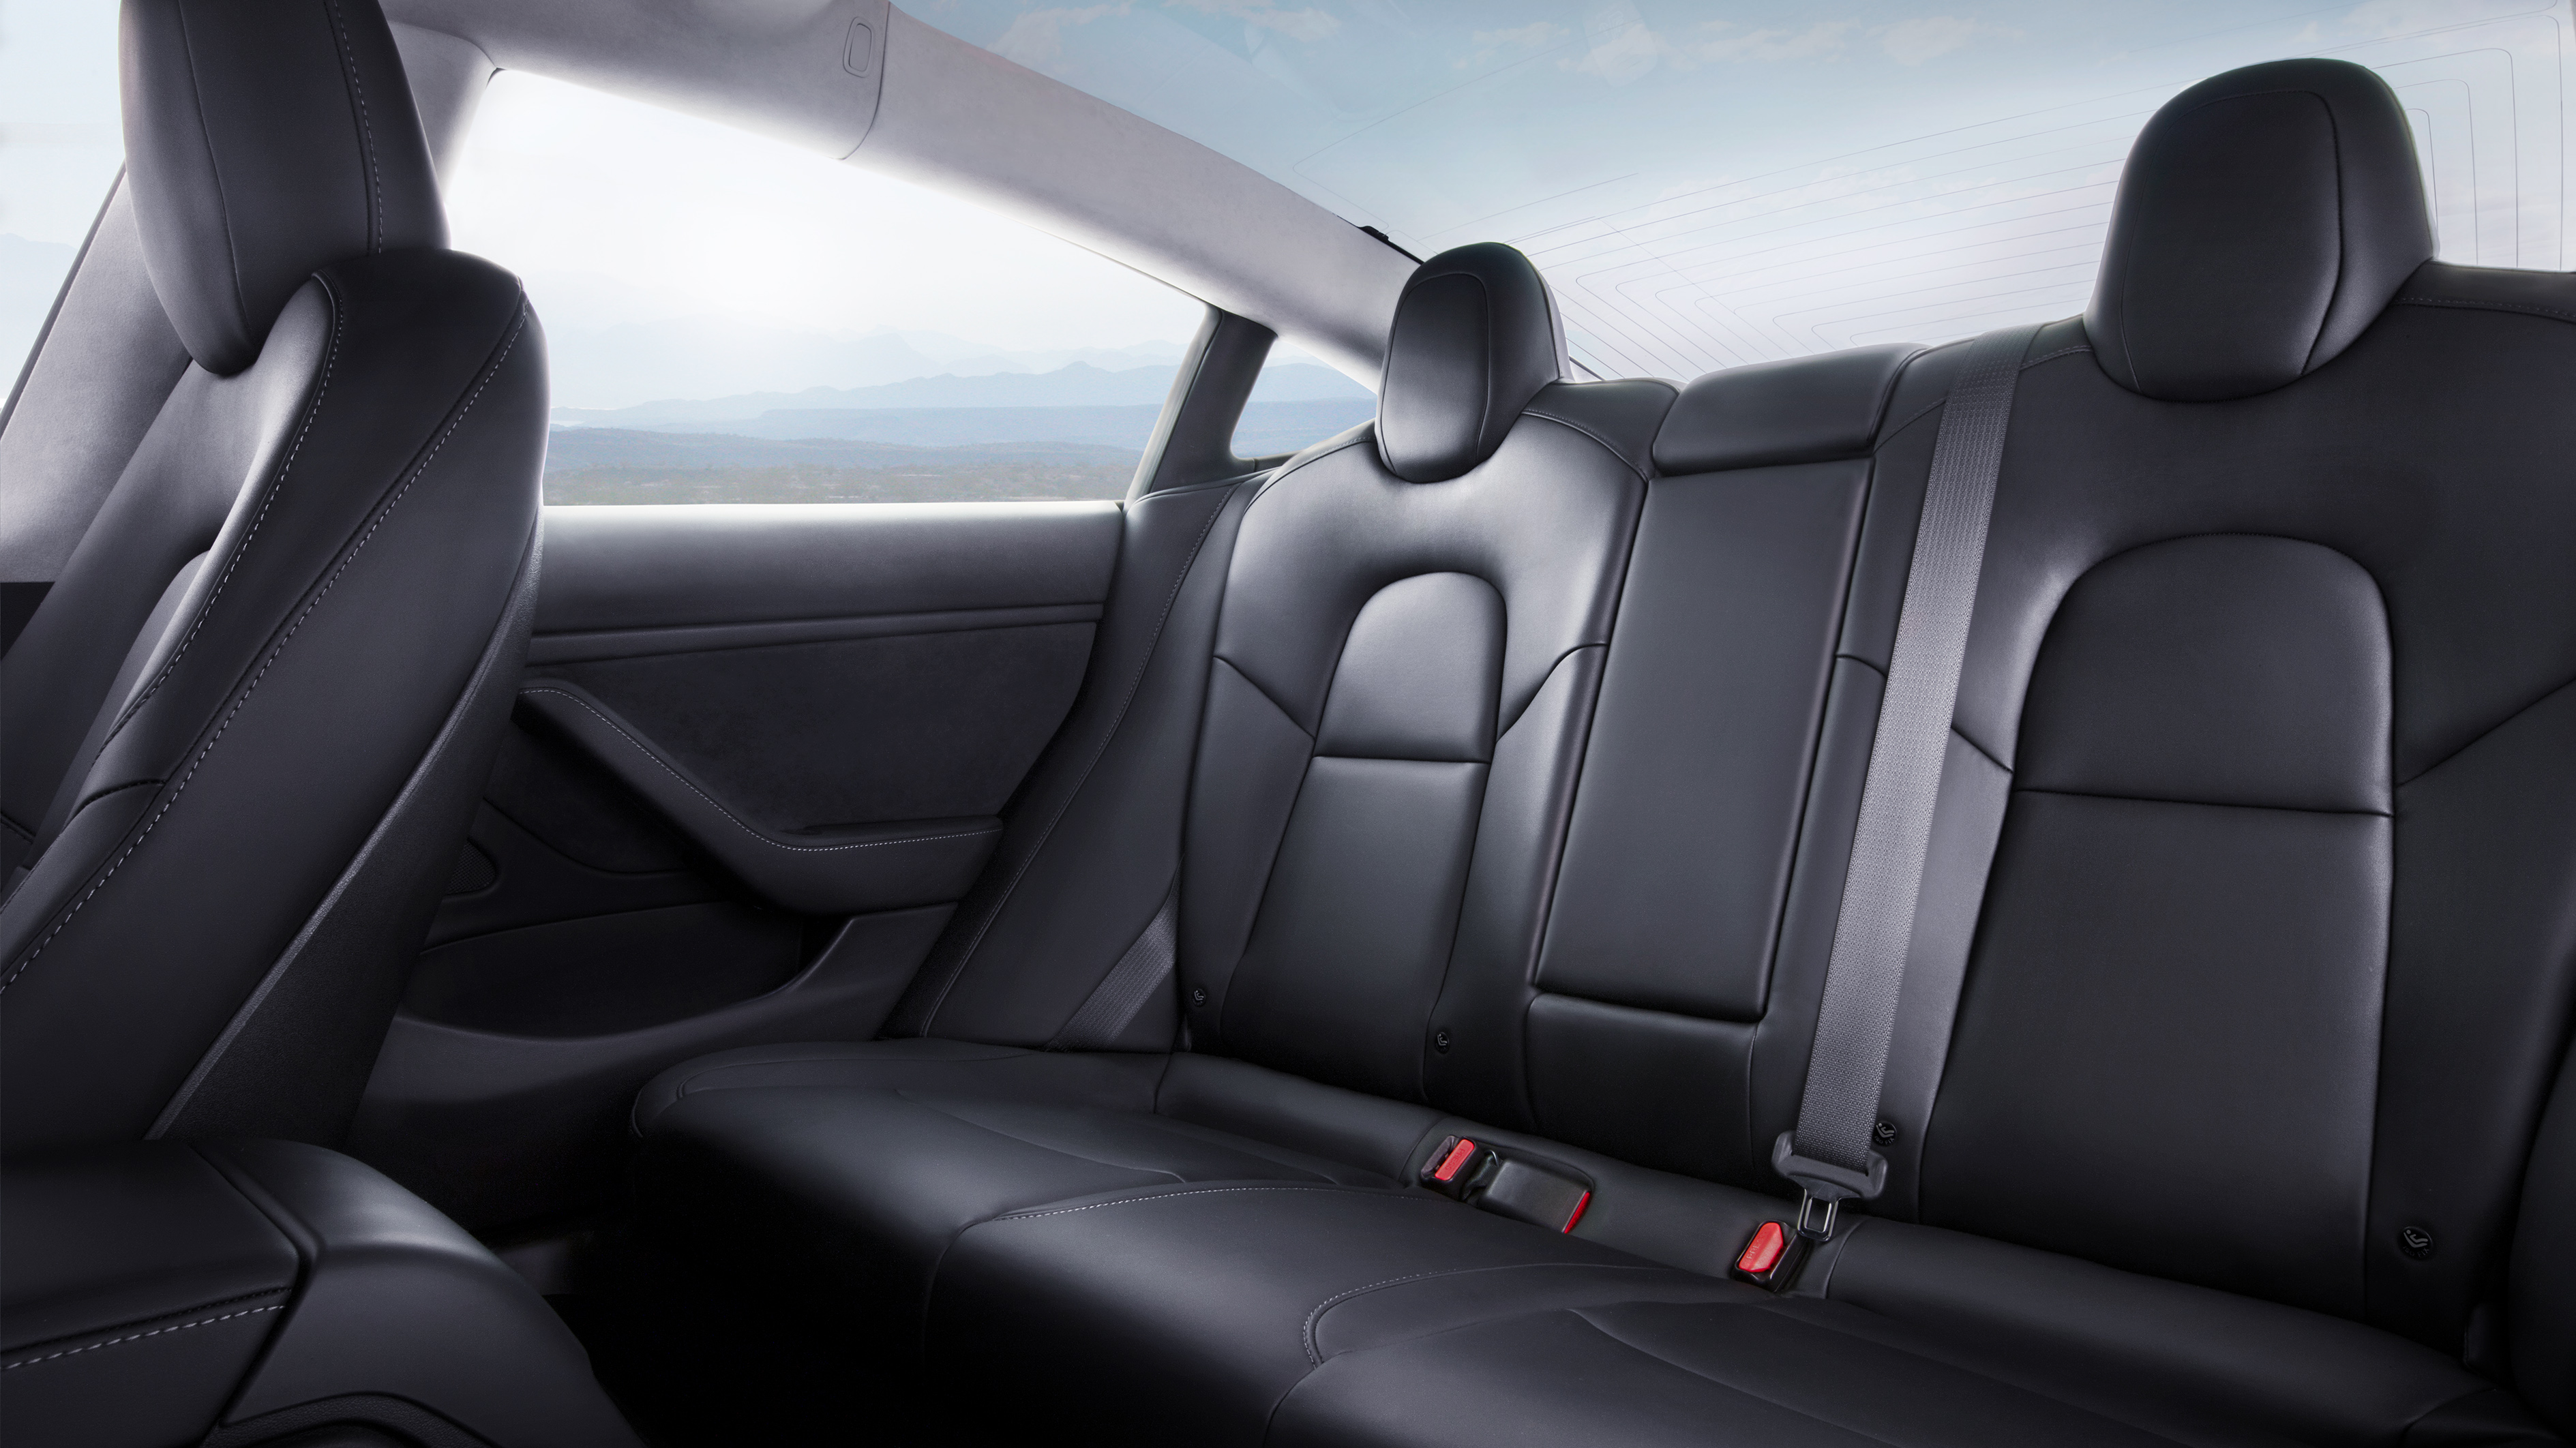 Tesla Model 3 interior rear